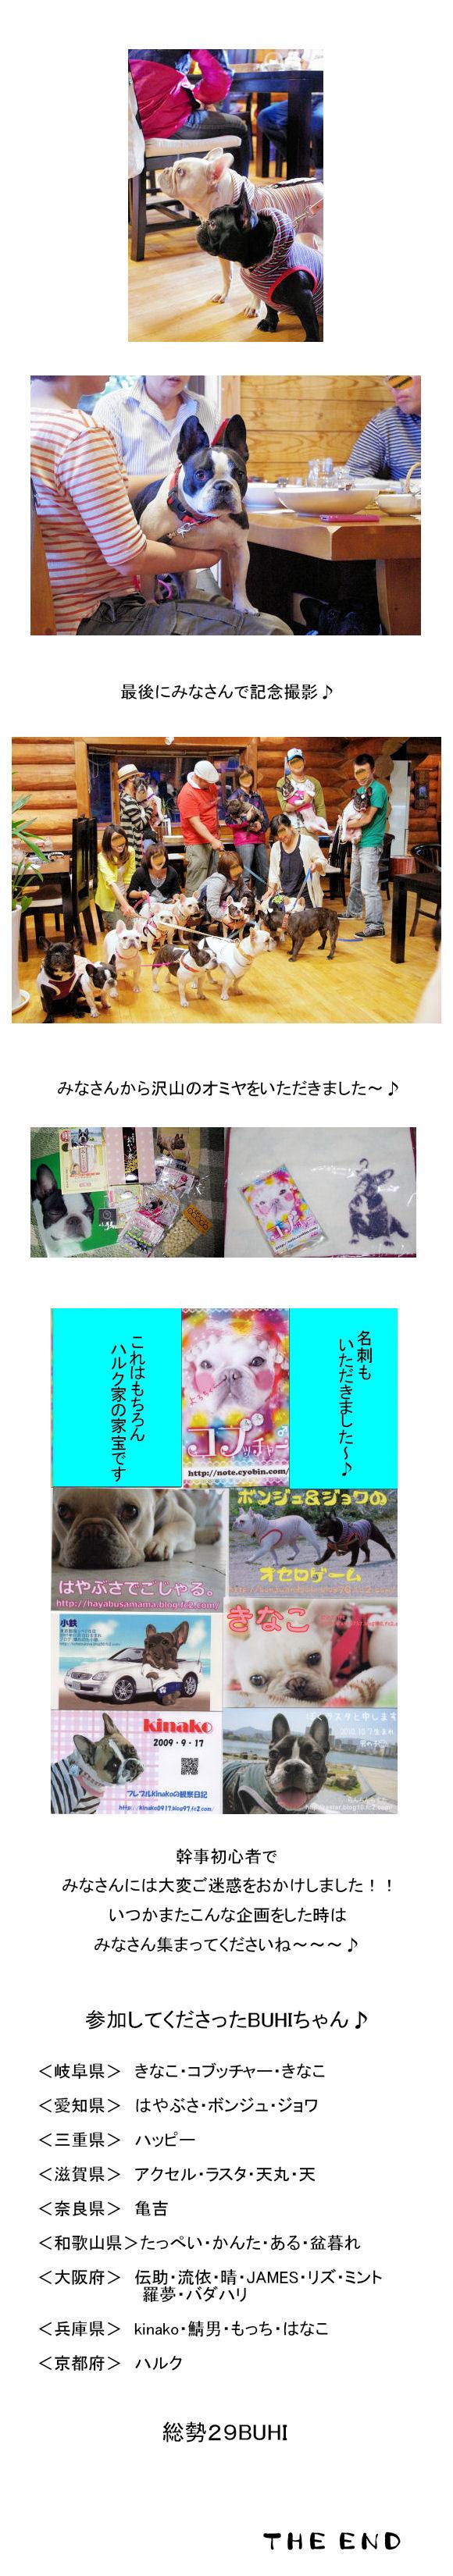 BUHI会♪最終章!!!